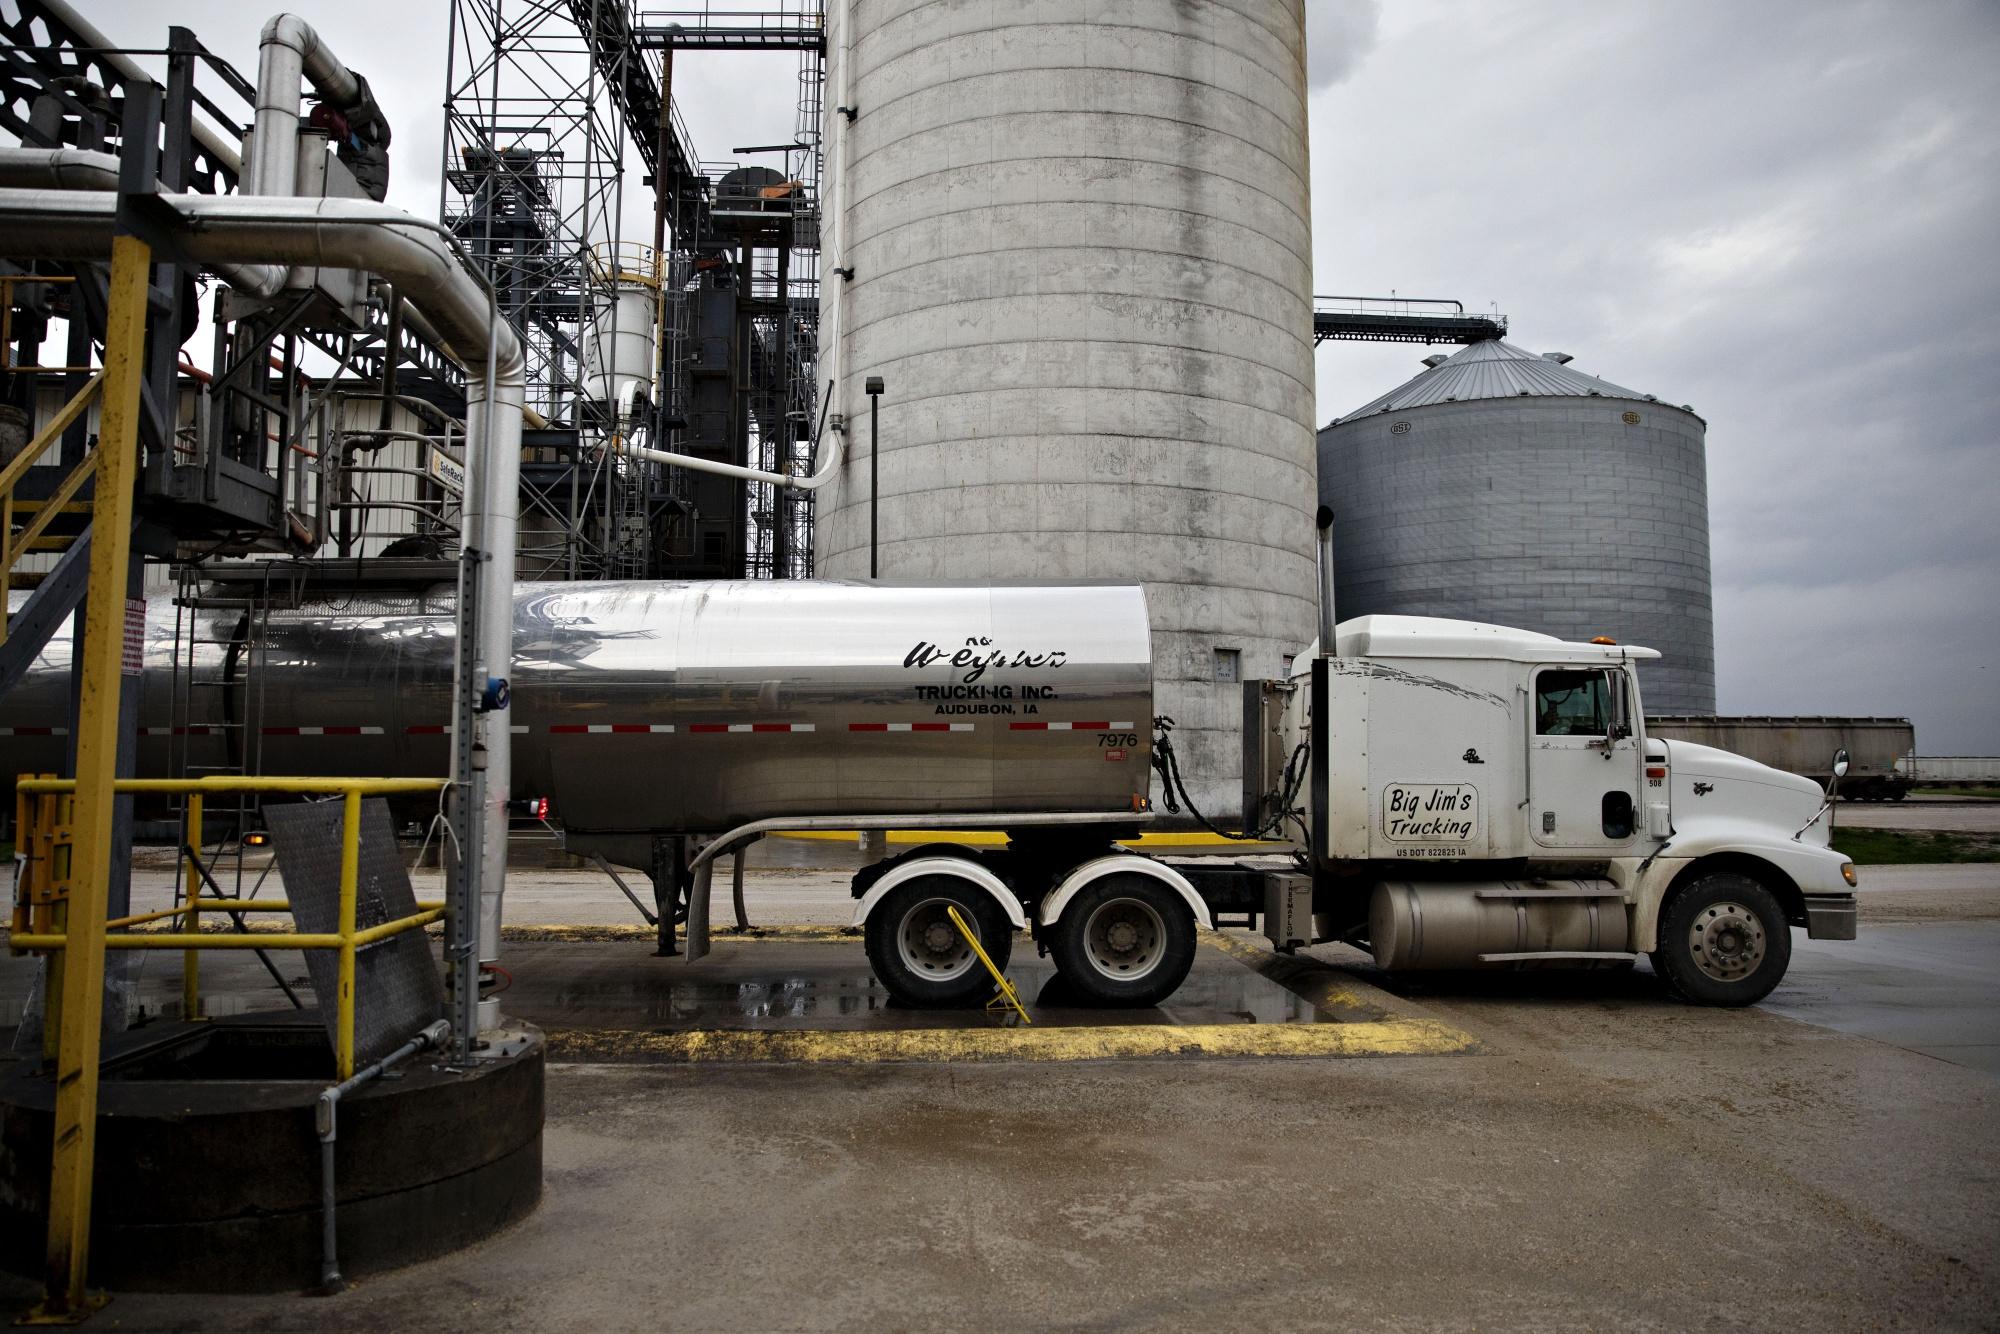 A tanker truck sits outside an ethanol biorefinery in Gowrie, Iowa.